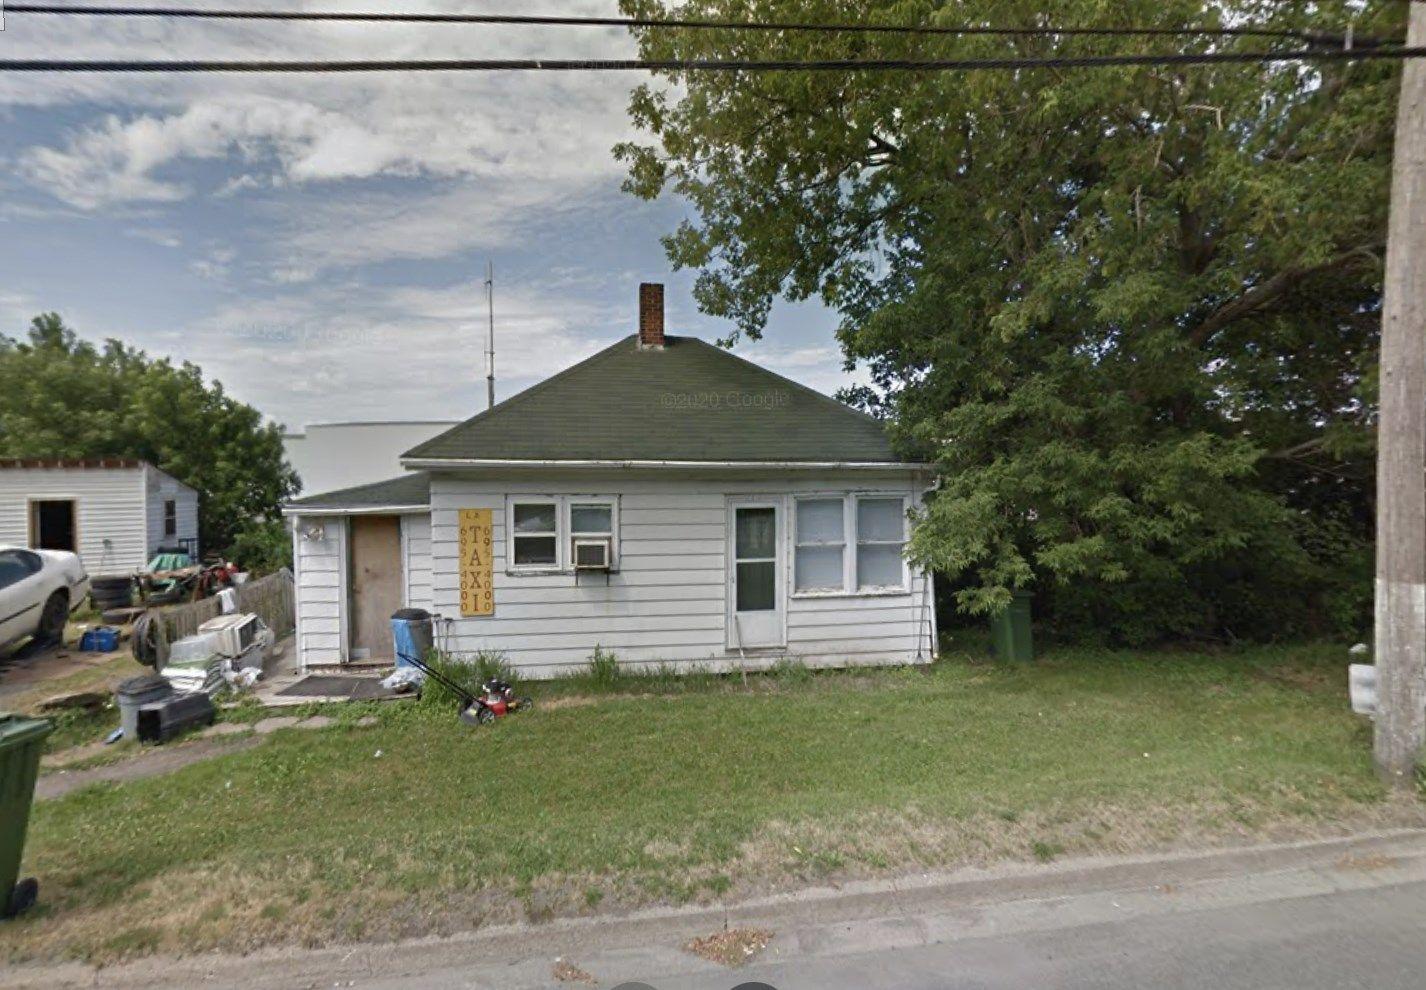 Main Photo: 161 Main Street in Trenton: 107-Trenton,Westville,Pictou Residential for sale (Northern Region)  : MLS®# 202108892